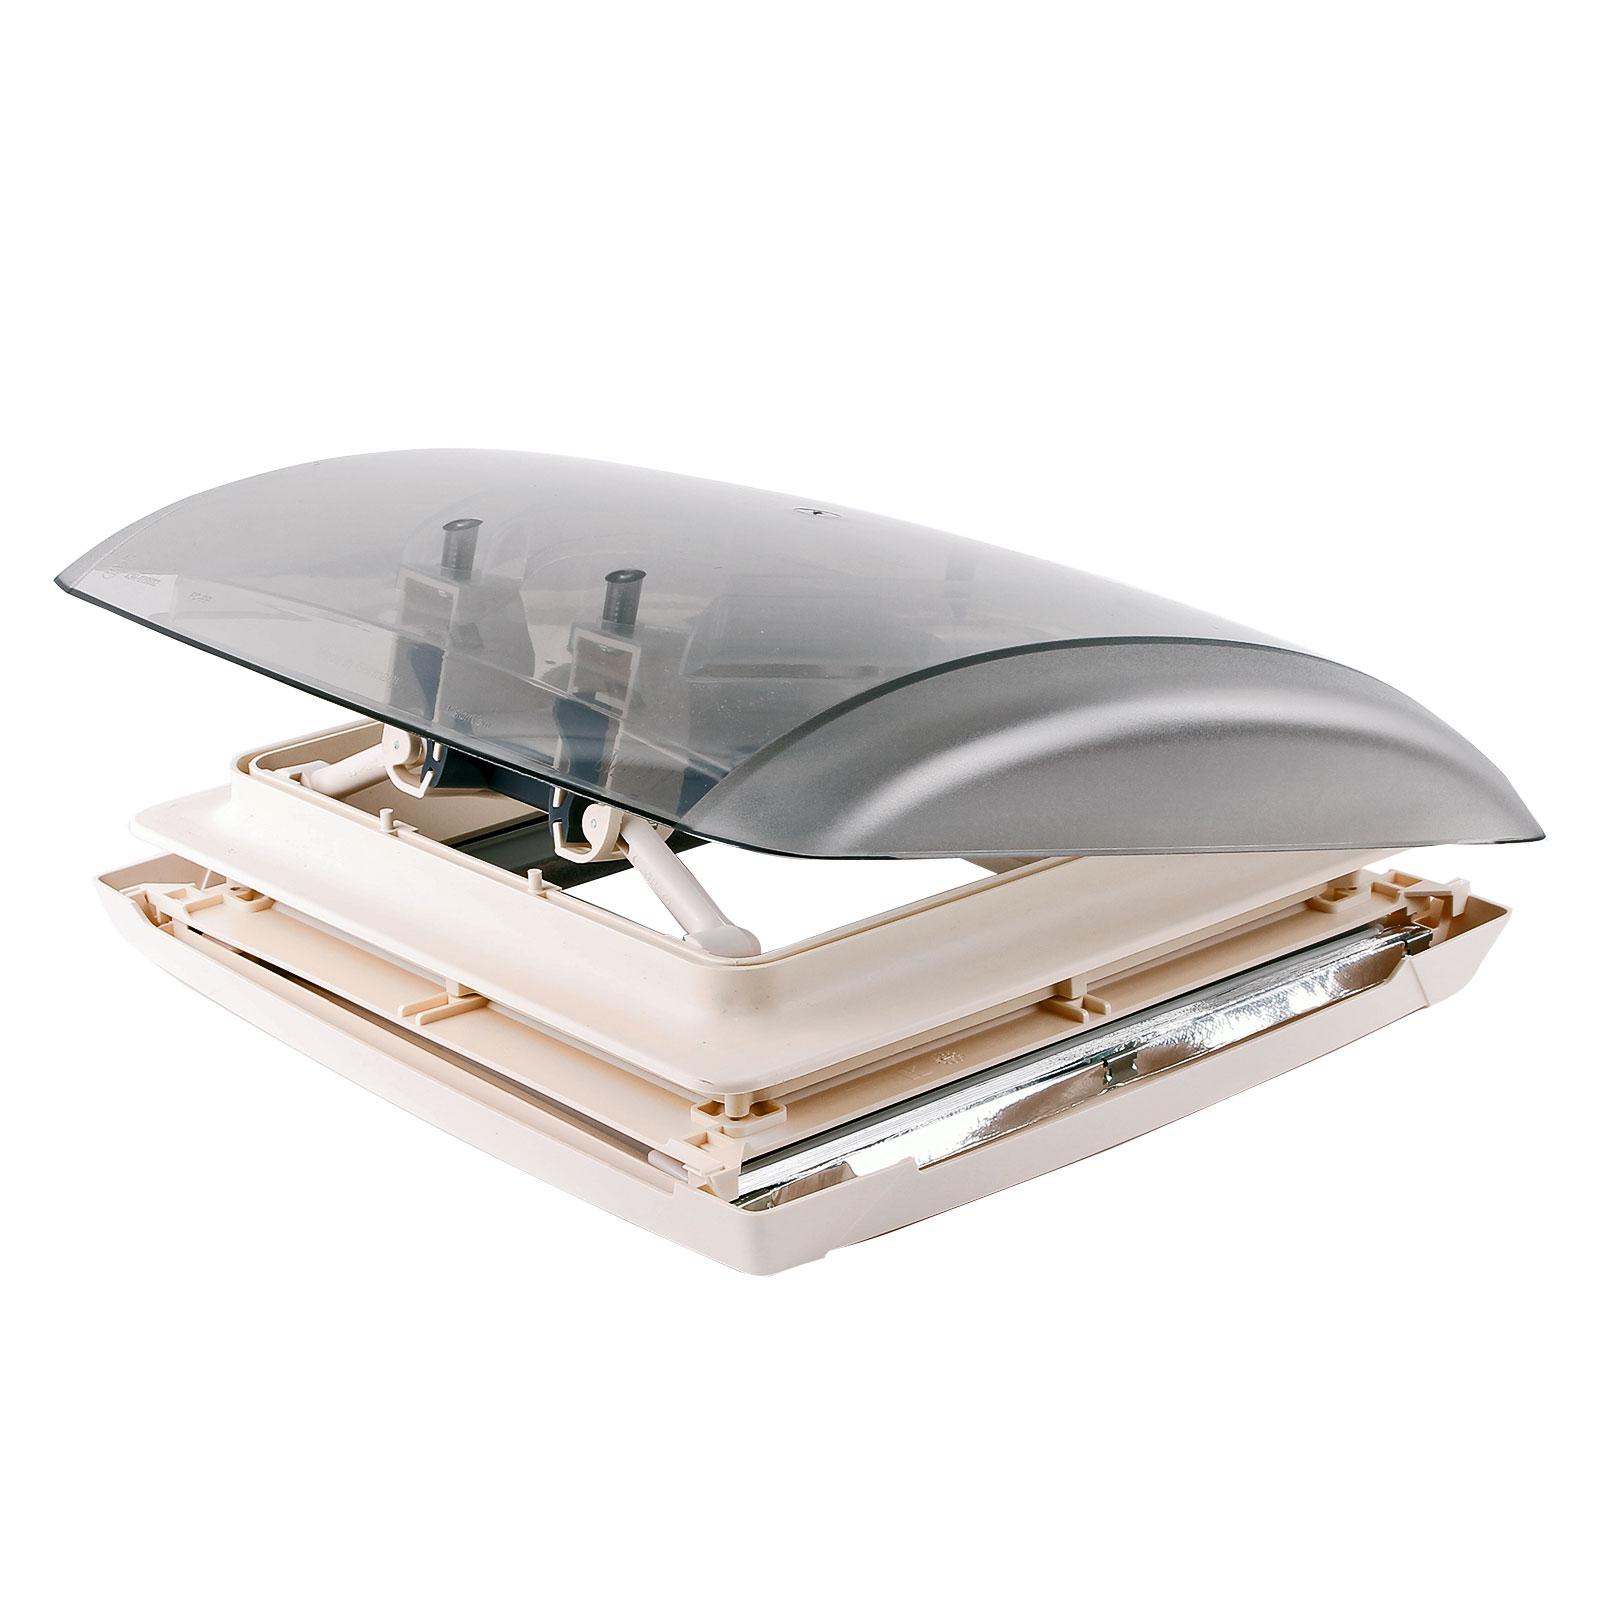 Dachhaube MPK Vision Vent S pro klar 28x28 cm Dachstärke 24-46 mm 27P